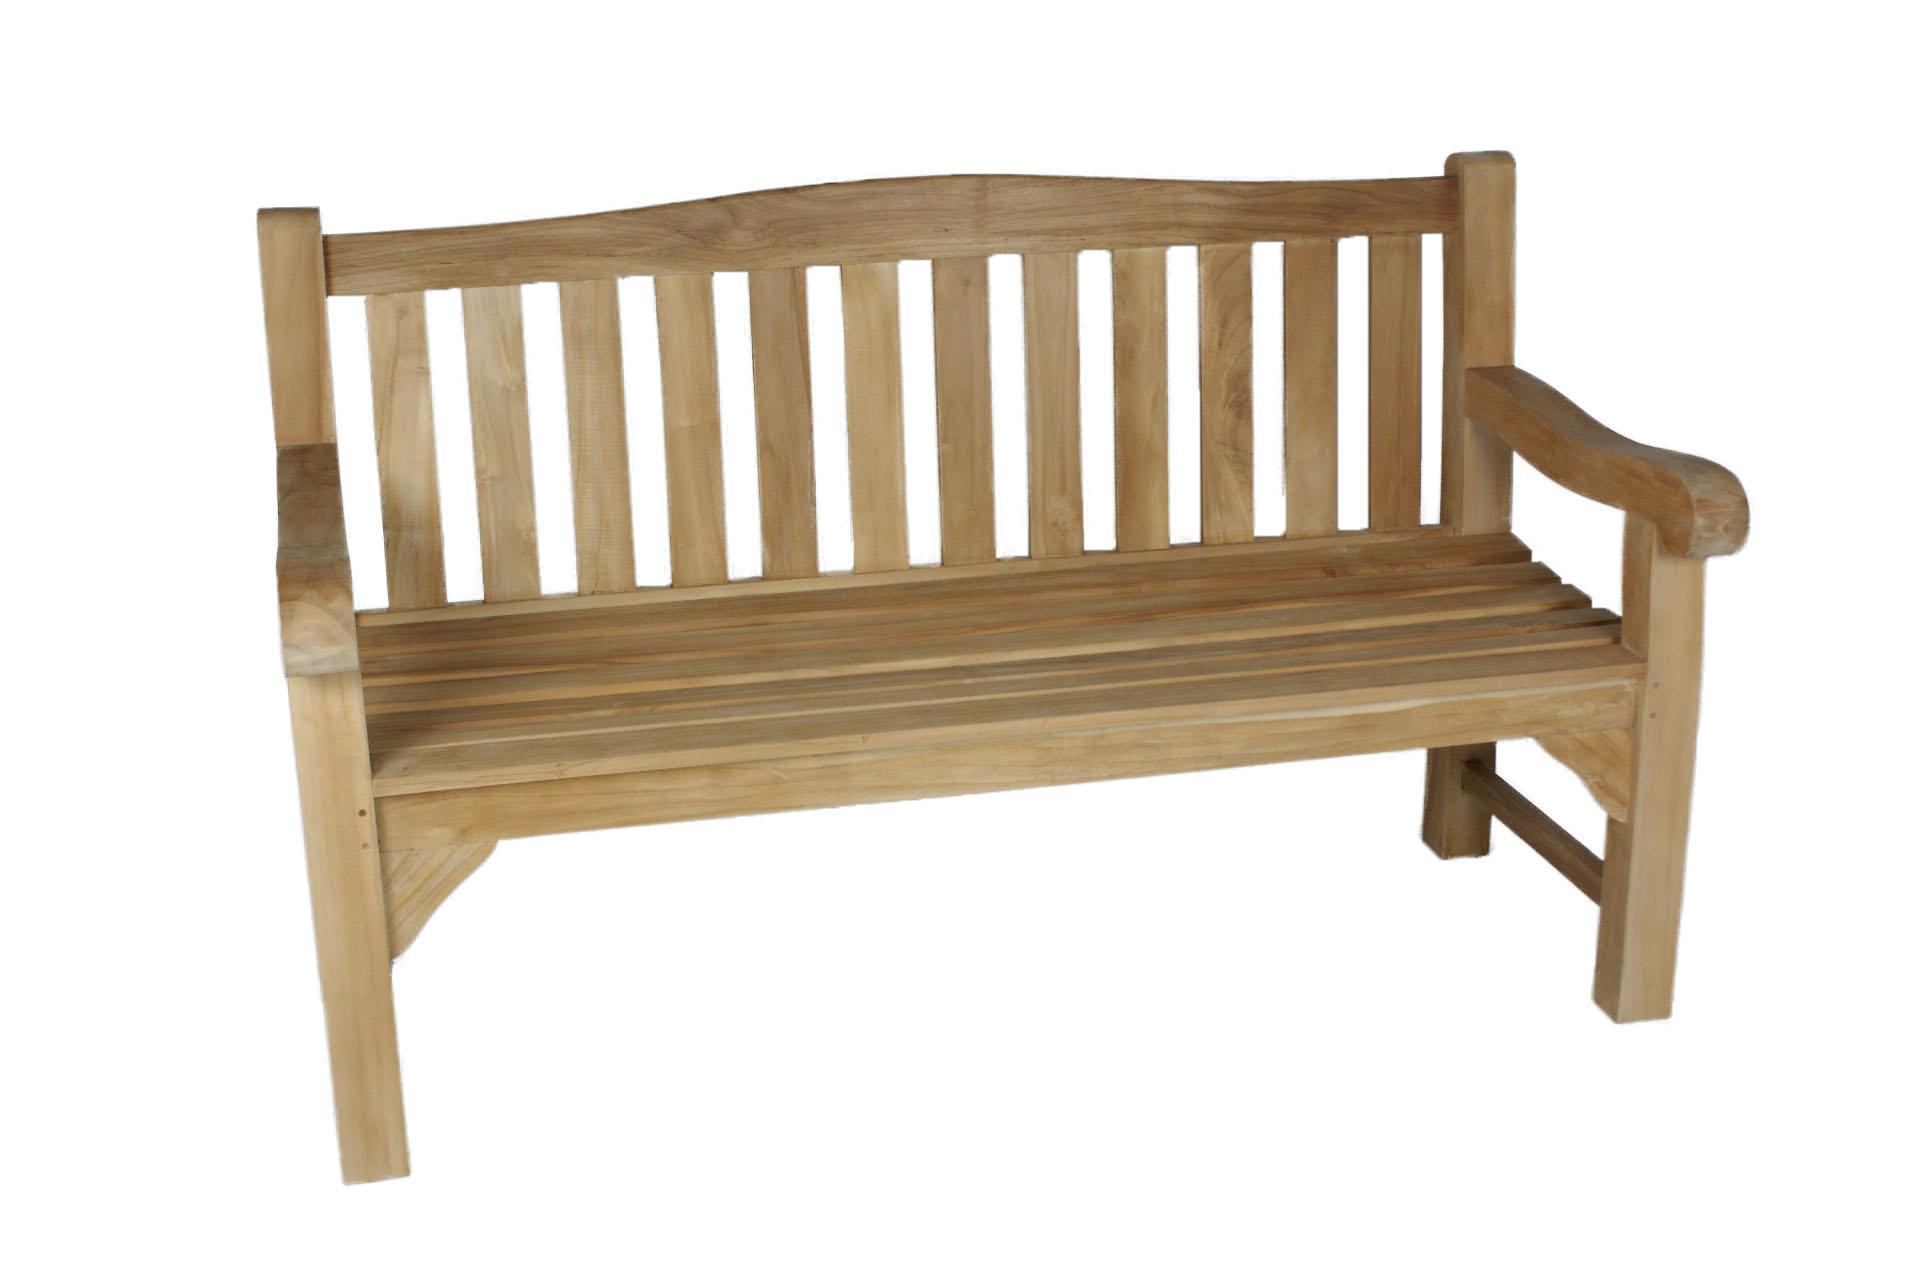 bench_warwick_150_angled_right.jpg